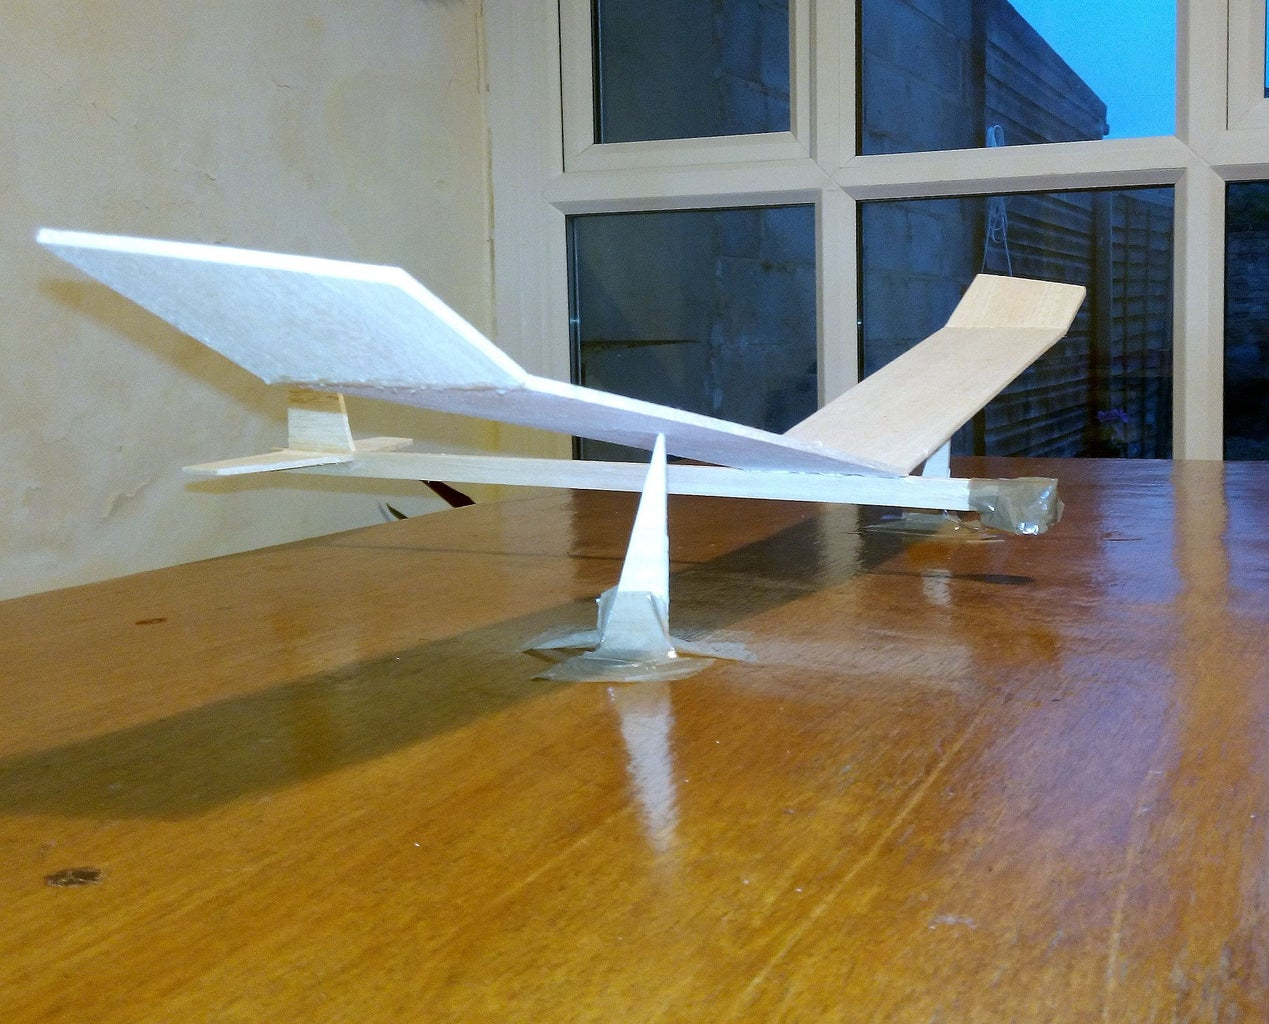 Balance the Plane